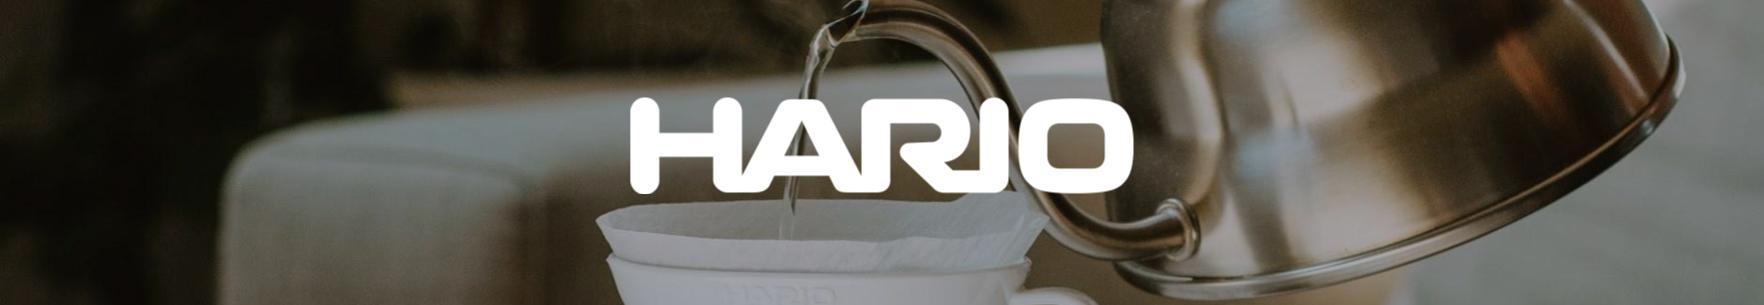 Hario kaffeudstyr - Brand